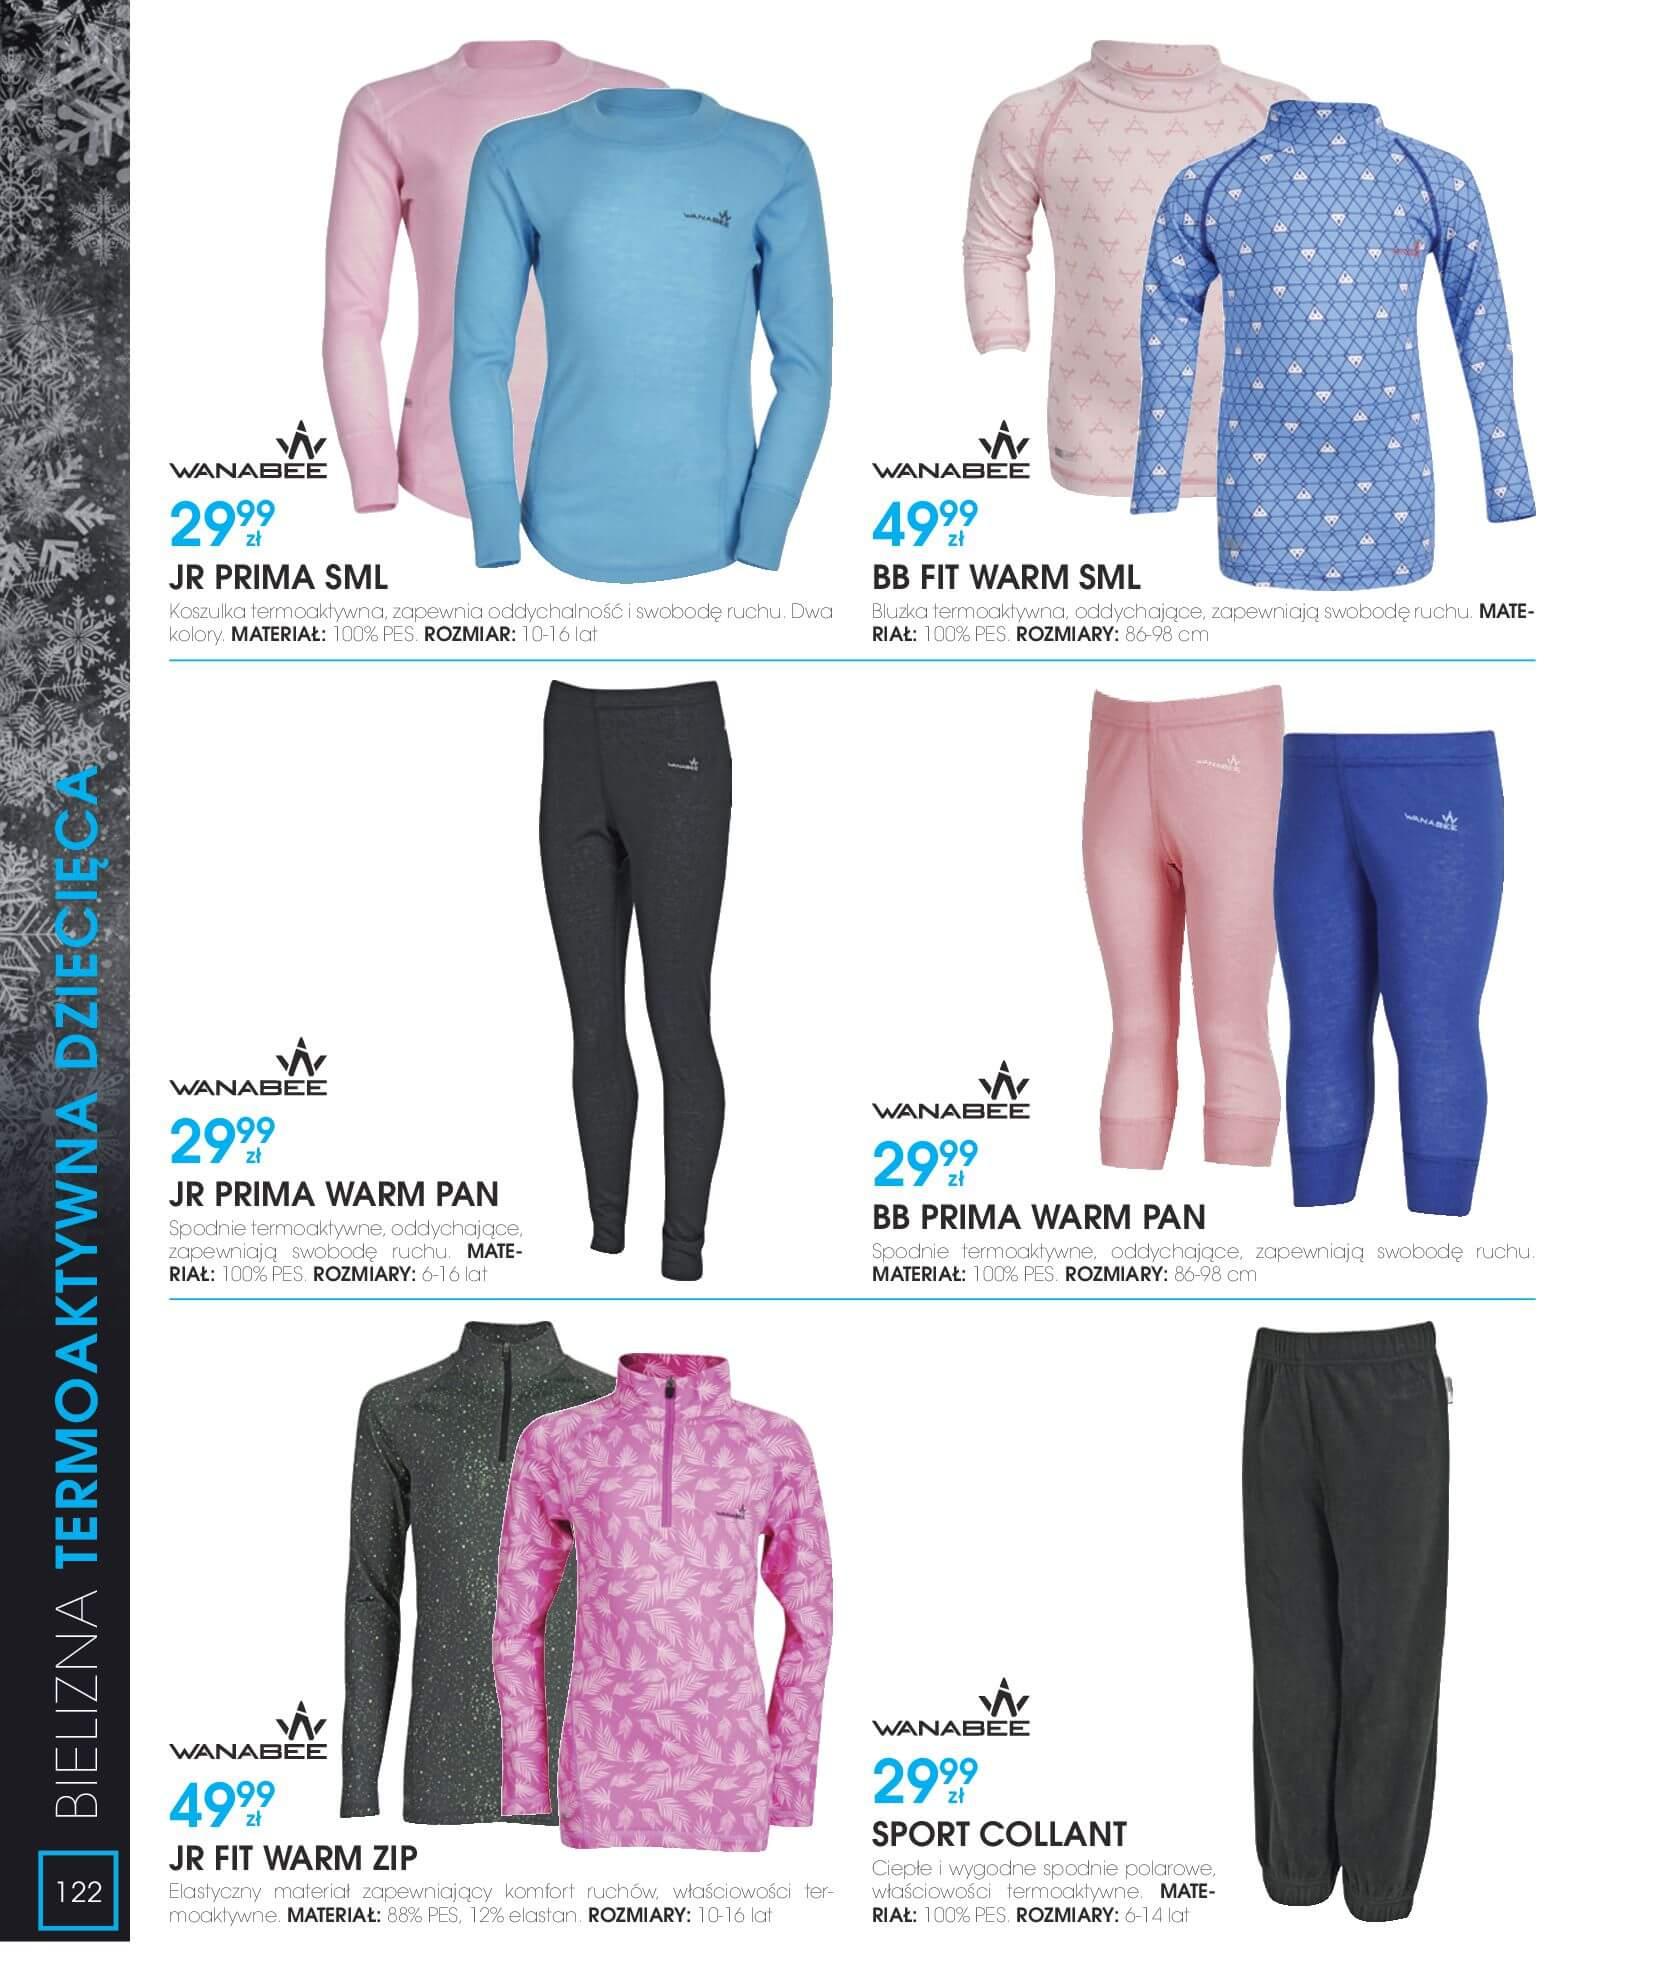 Gazetka Go Sport - Katalog Zima 2017/2018-12.11.2017-28.02.2018-page-122